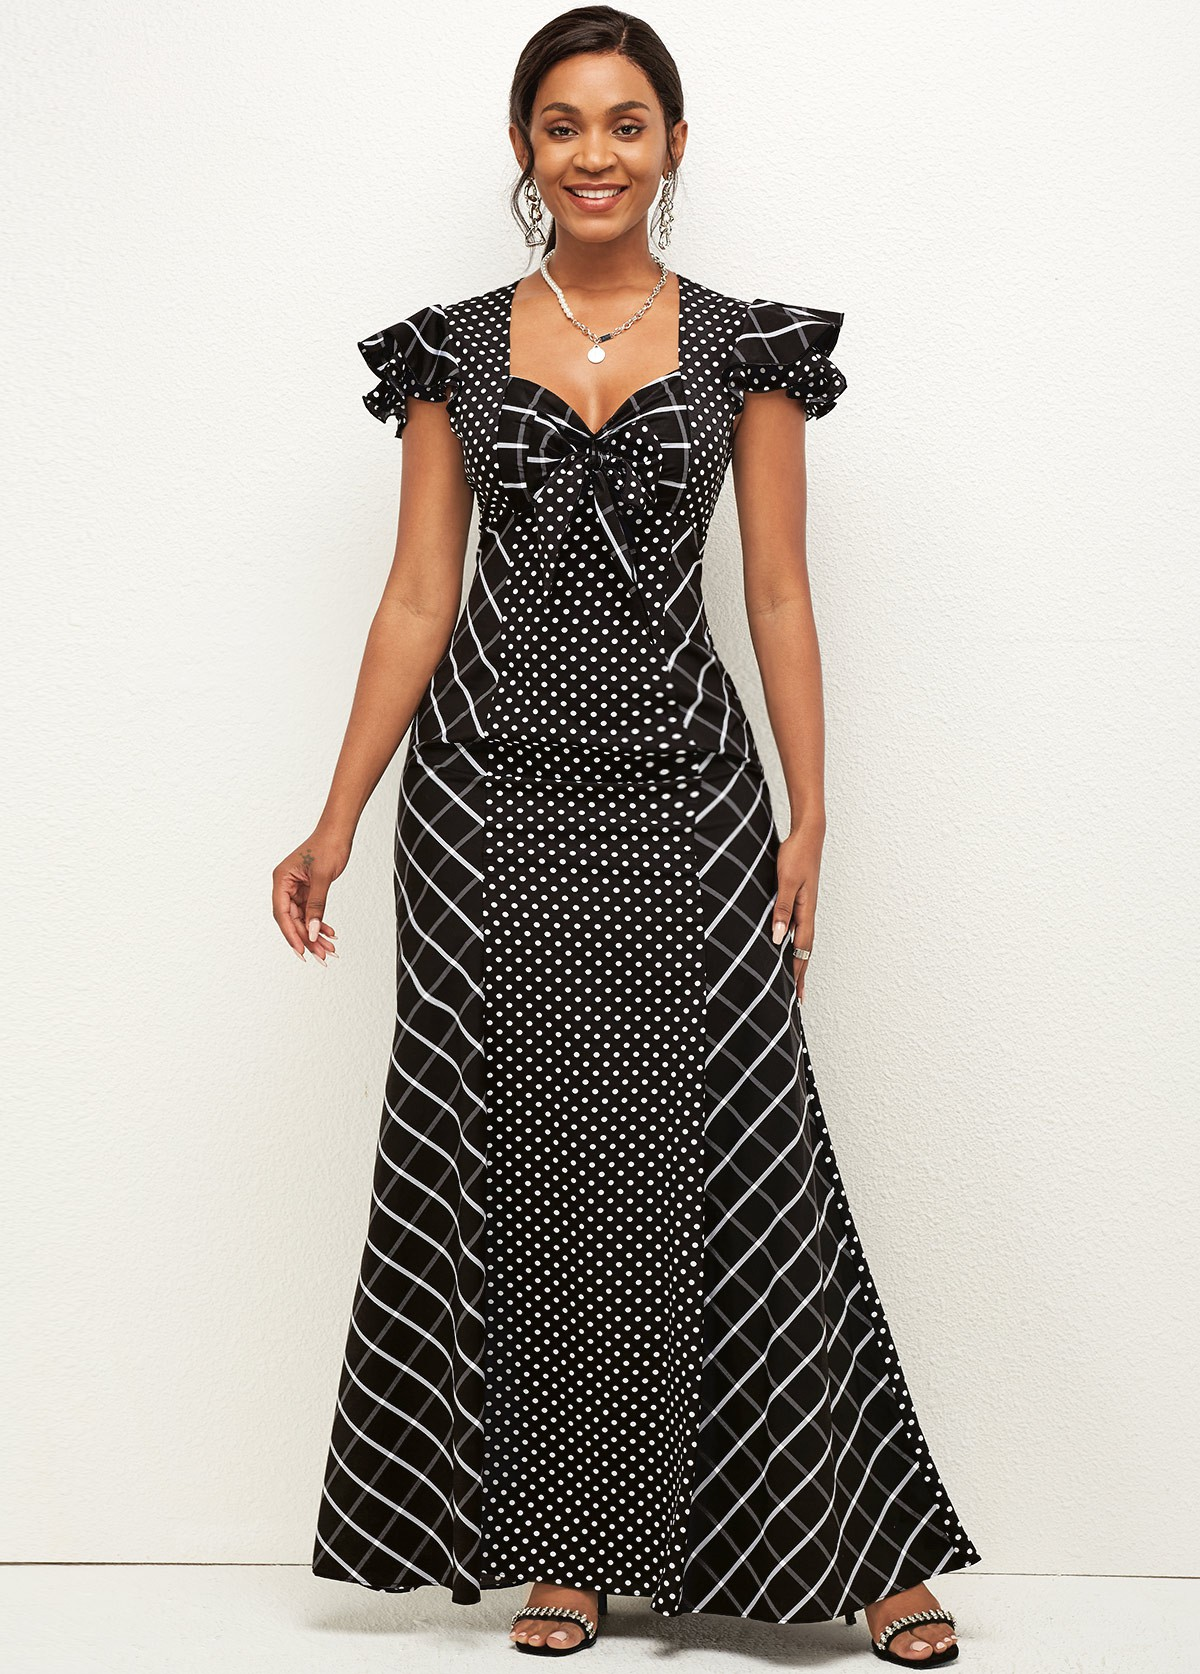 Polka Dot Bowknot Sweetheart Neckline Dress